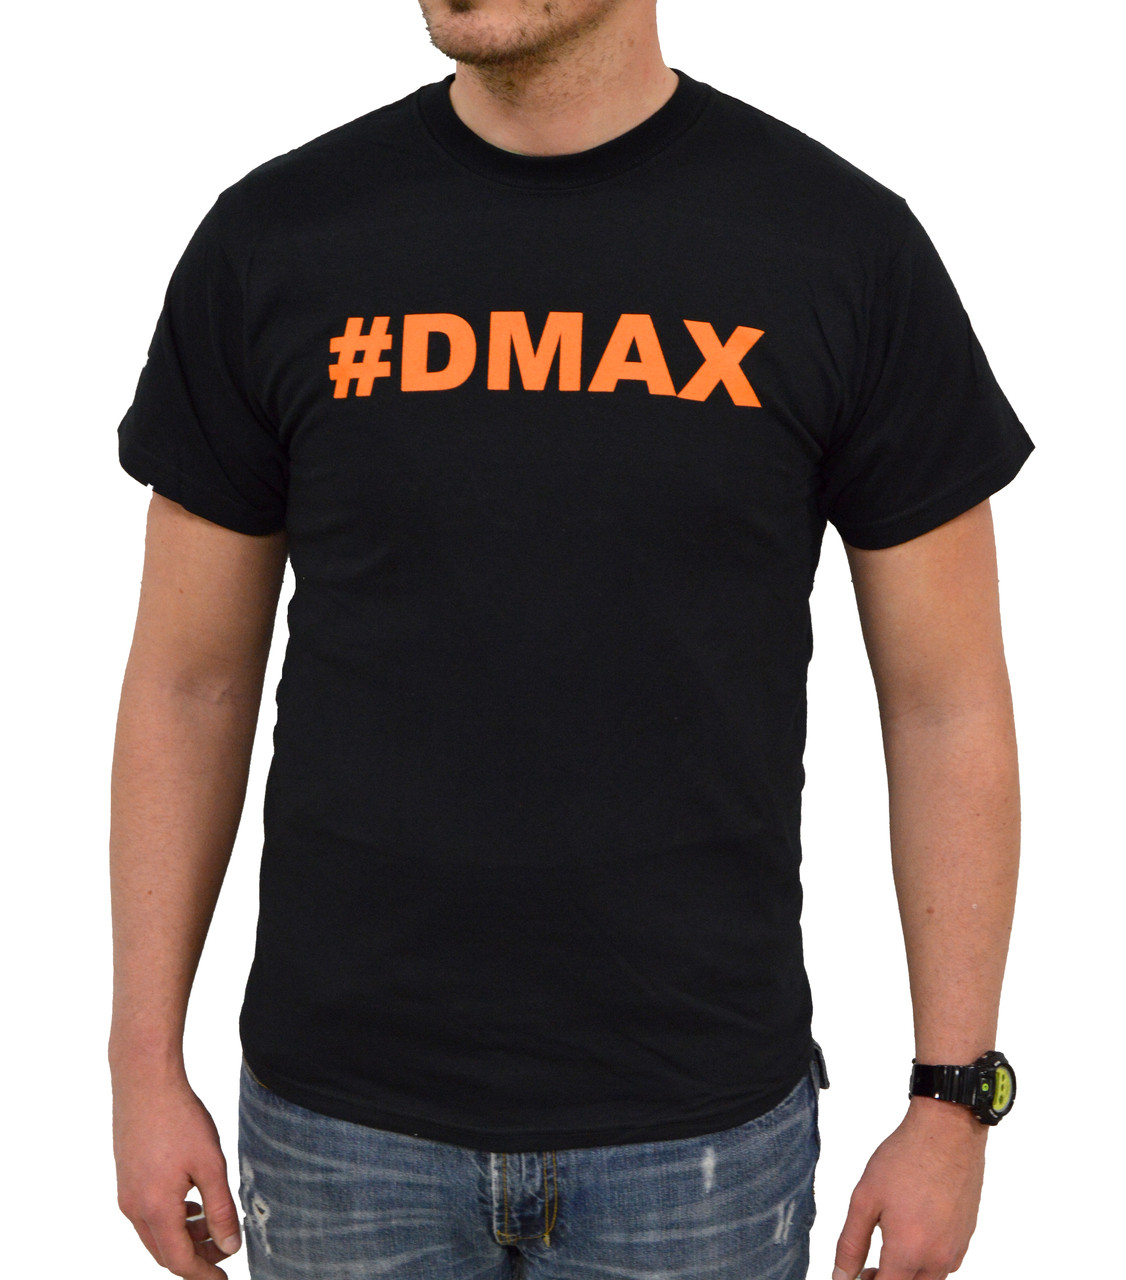 DuramaxGear - Hashtag DMAX Tee - Black and Orange (T14007-O)